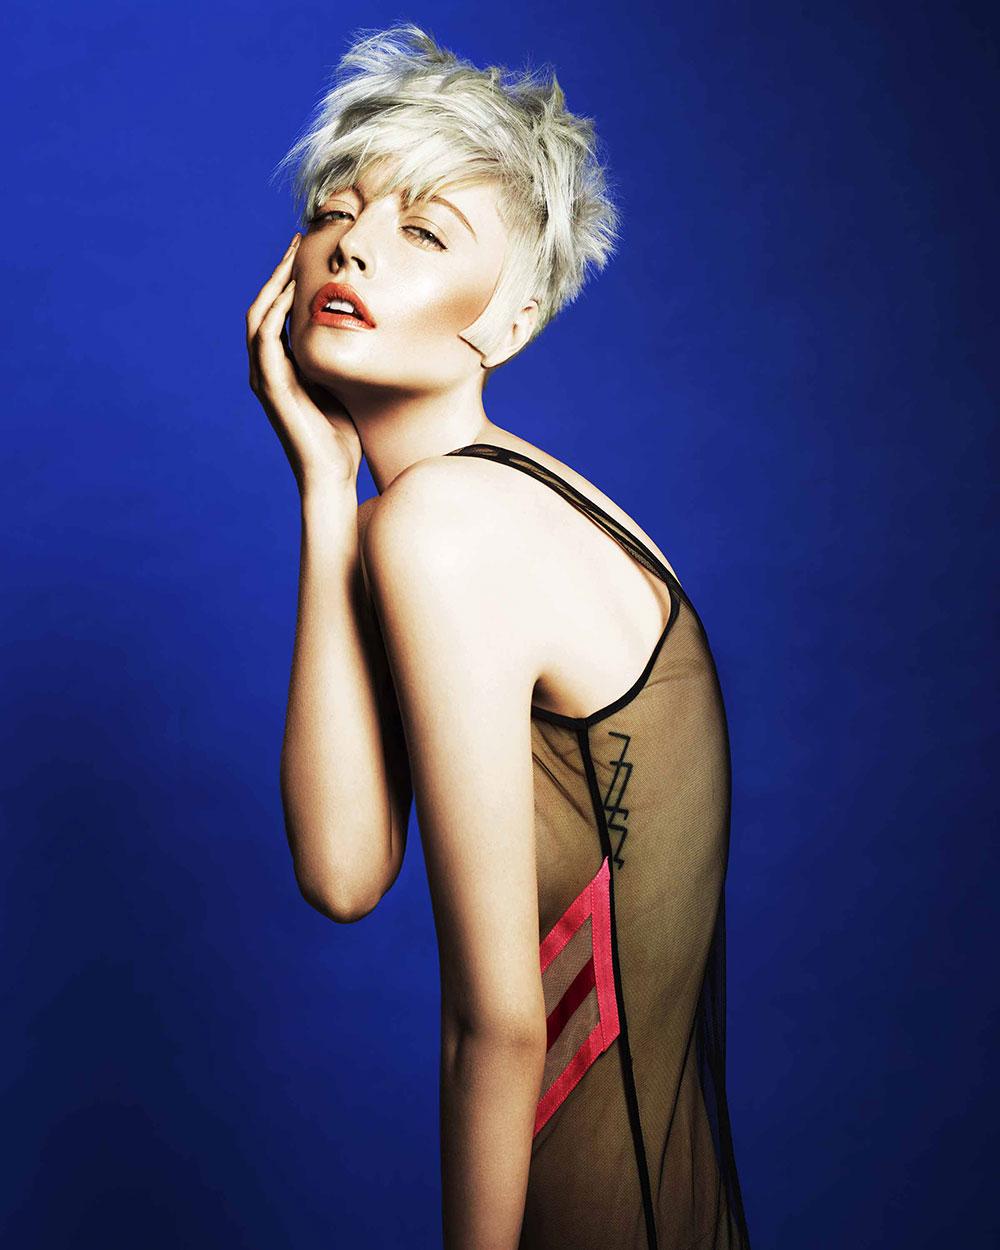 Platinum blonde crop with soft feminine styling